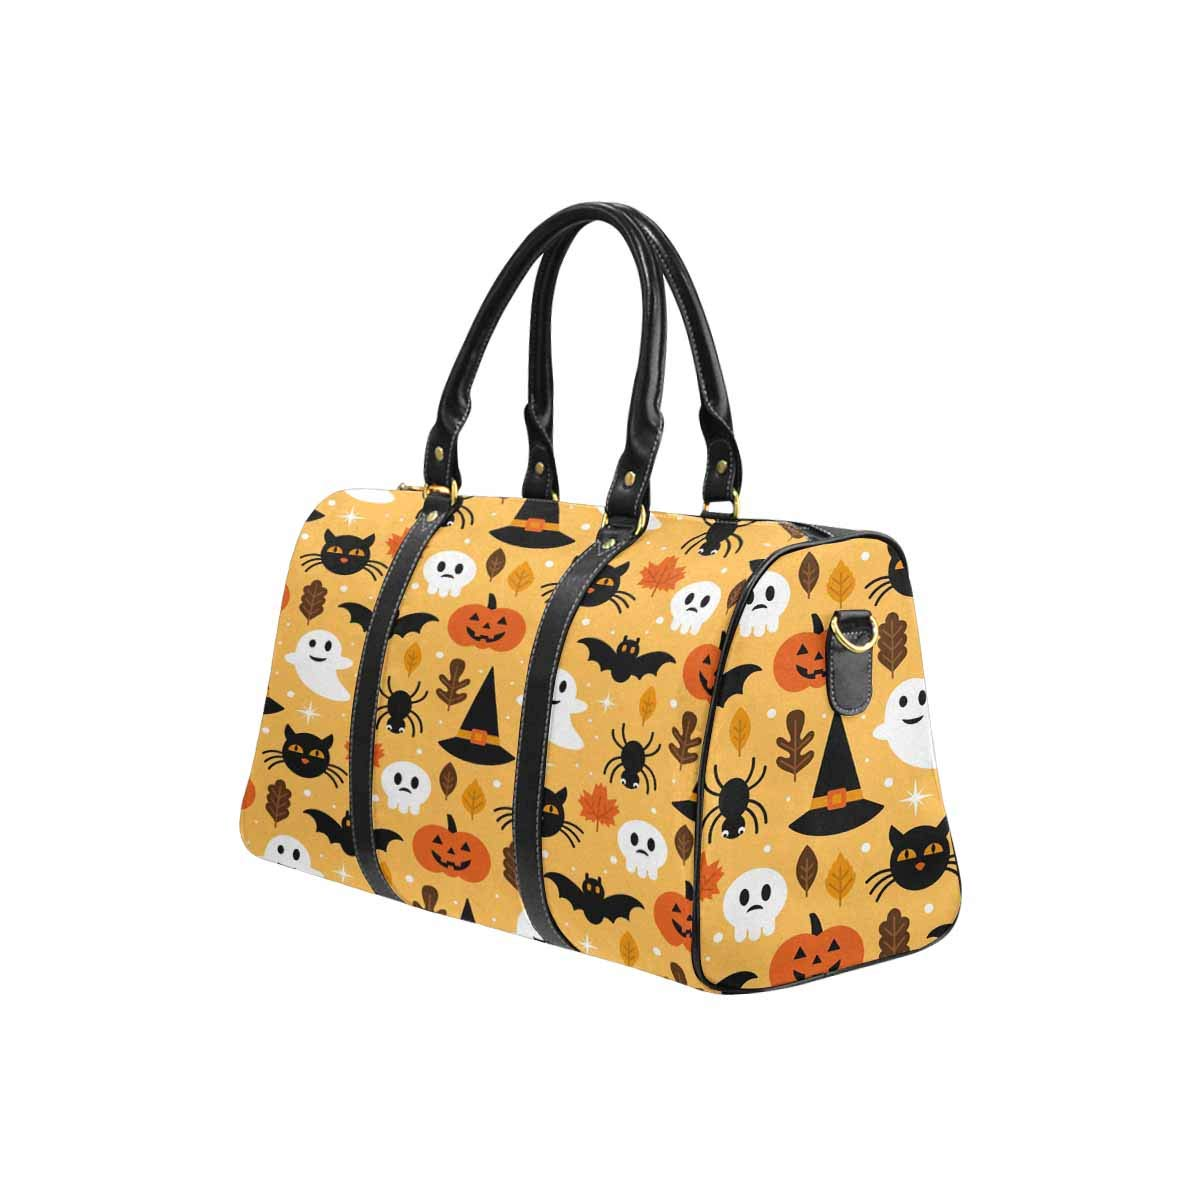 InterestPrint Unisex Duffel Bag Carry-on Bag Overnight Bag Weekender Bag Cute Watercolor Elephants